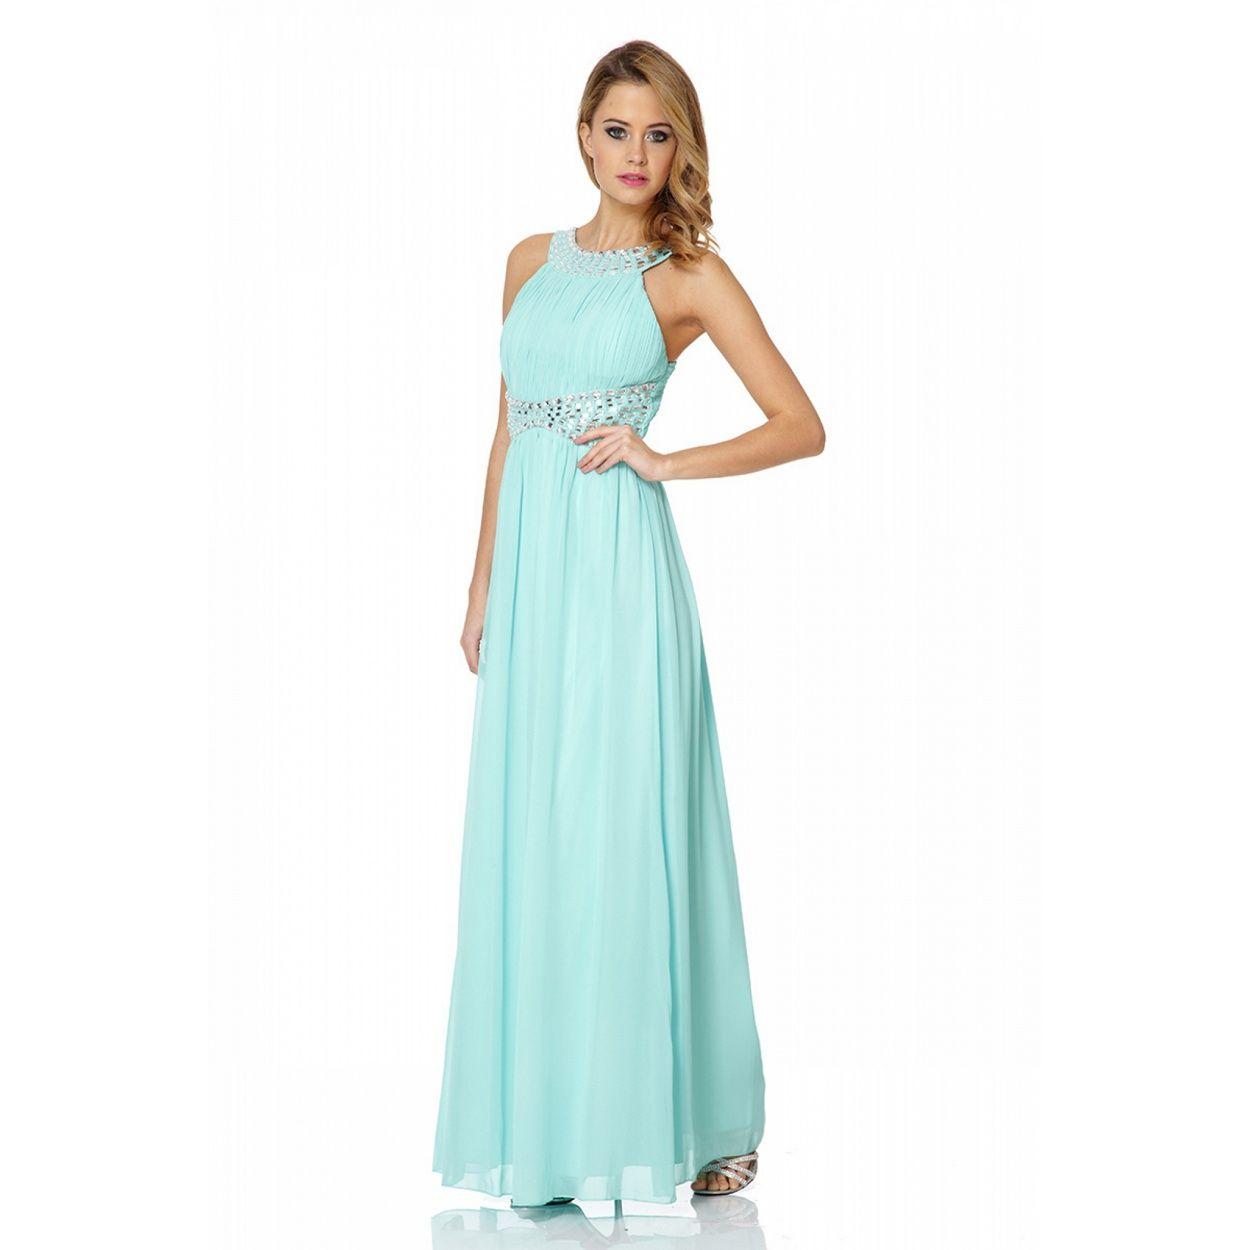 Quiz aqua chiffon beaded maxi dress at debenhams wedding maxi dresses ombrellifo Choice Image